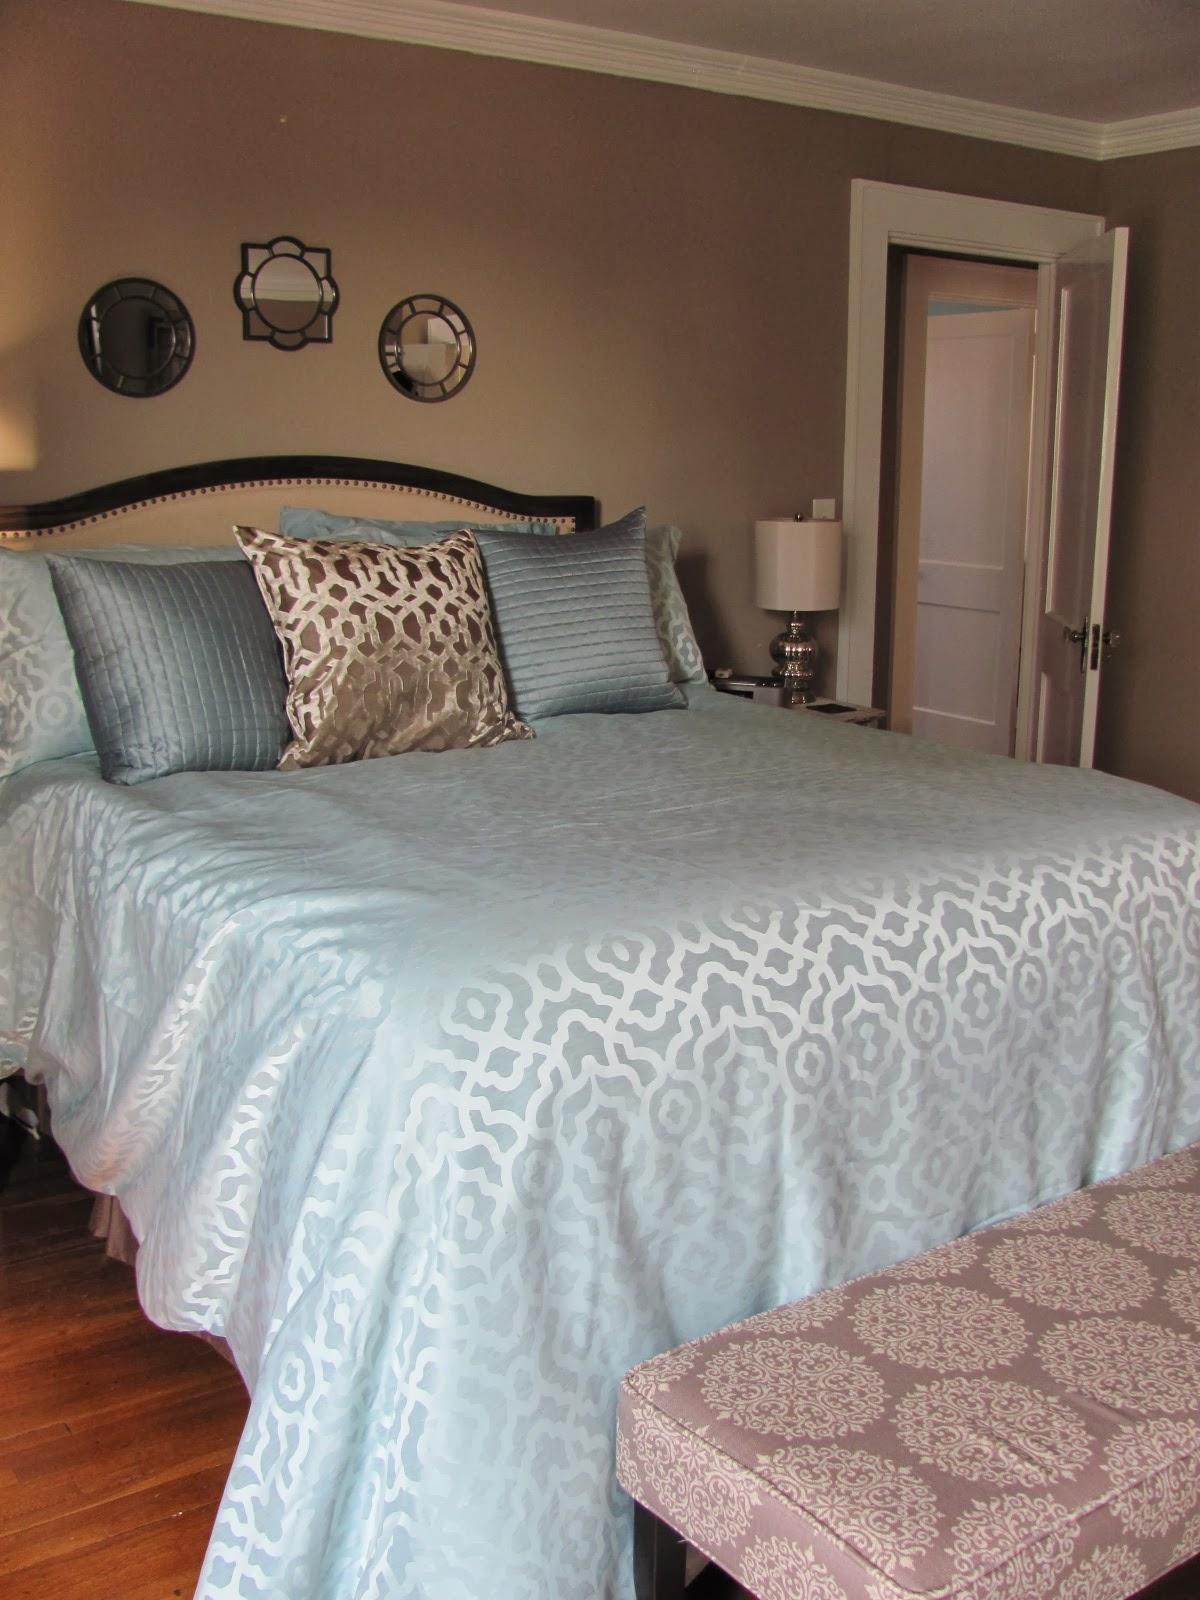 Master Bedroom organization after redesign